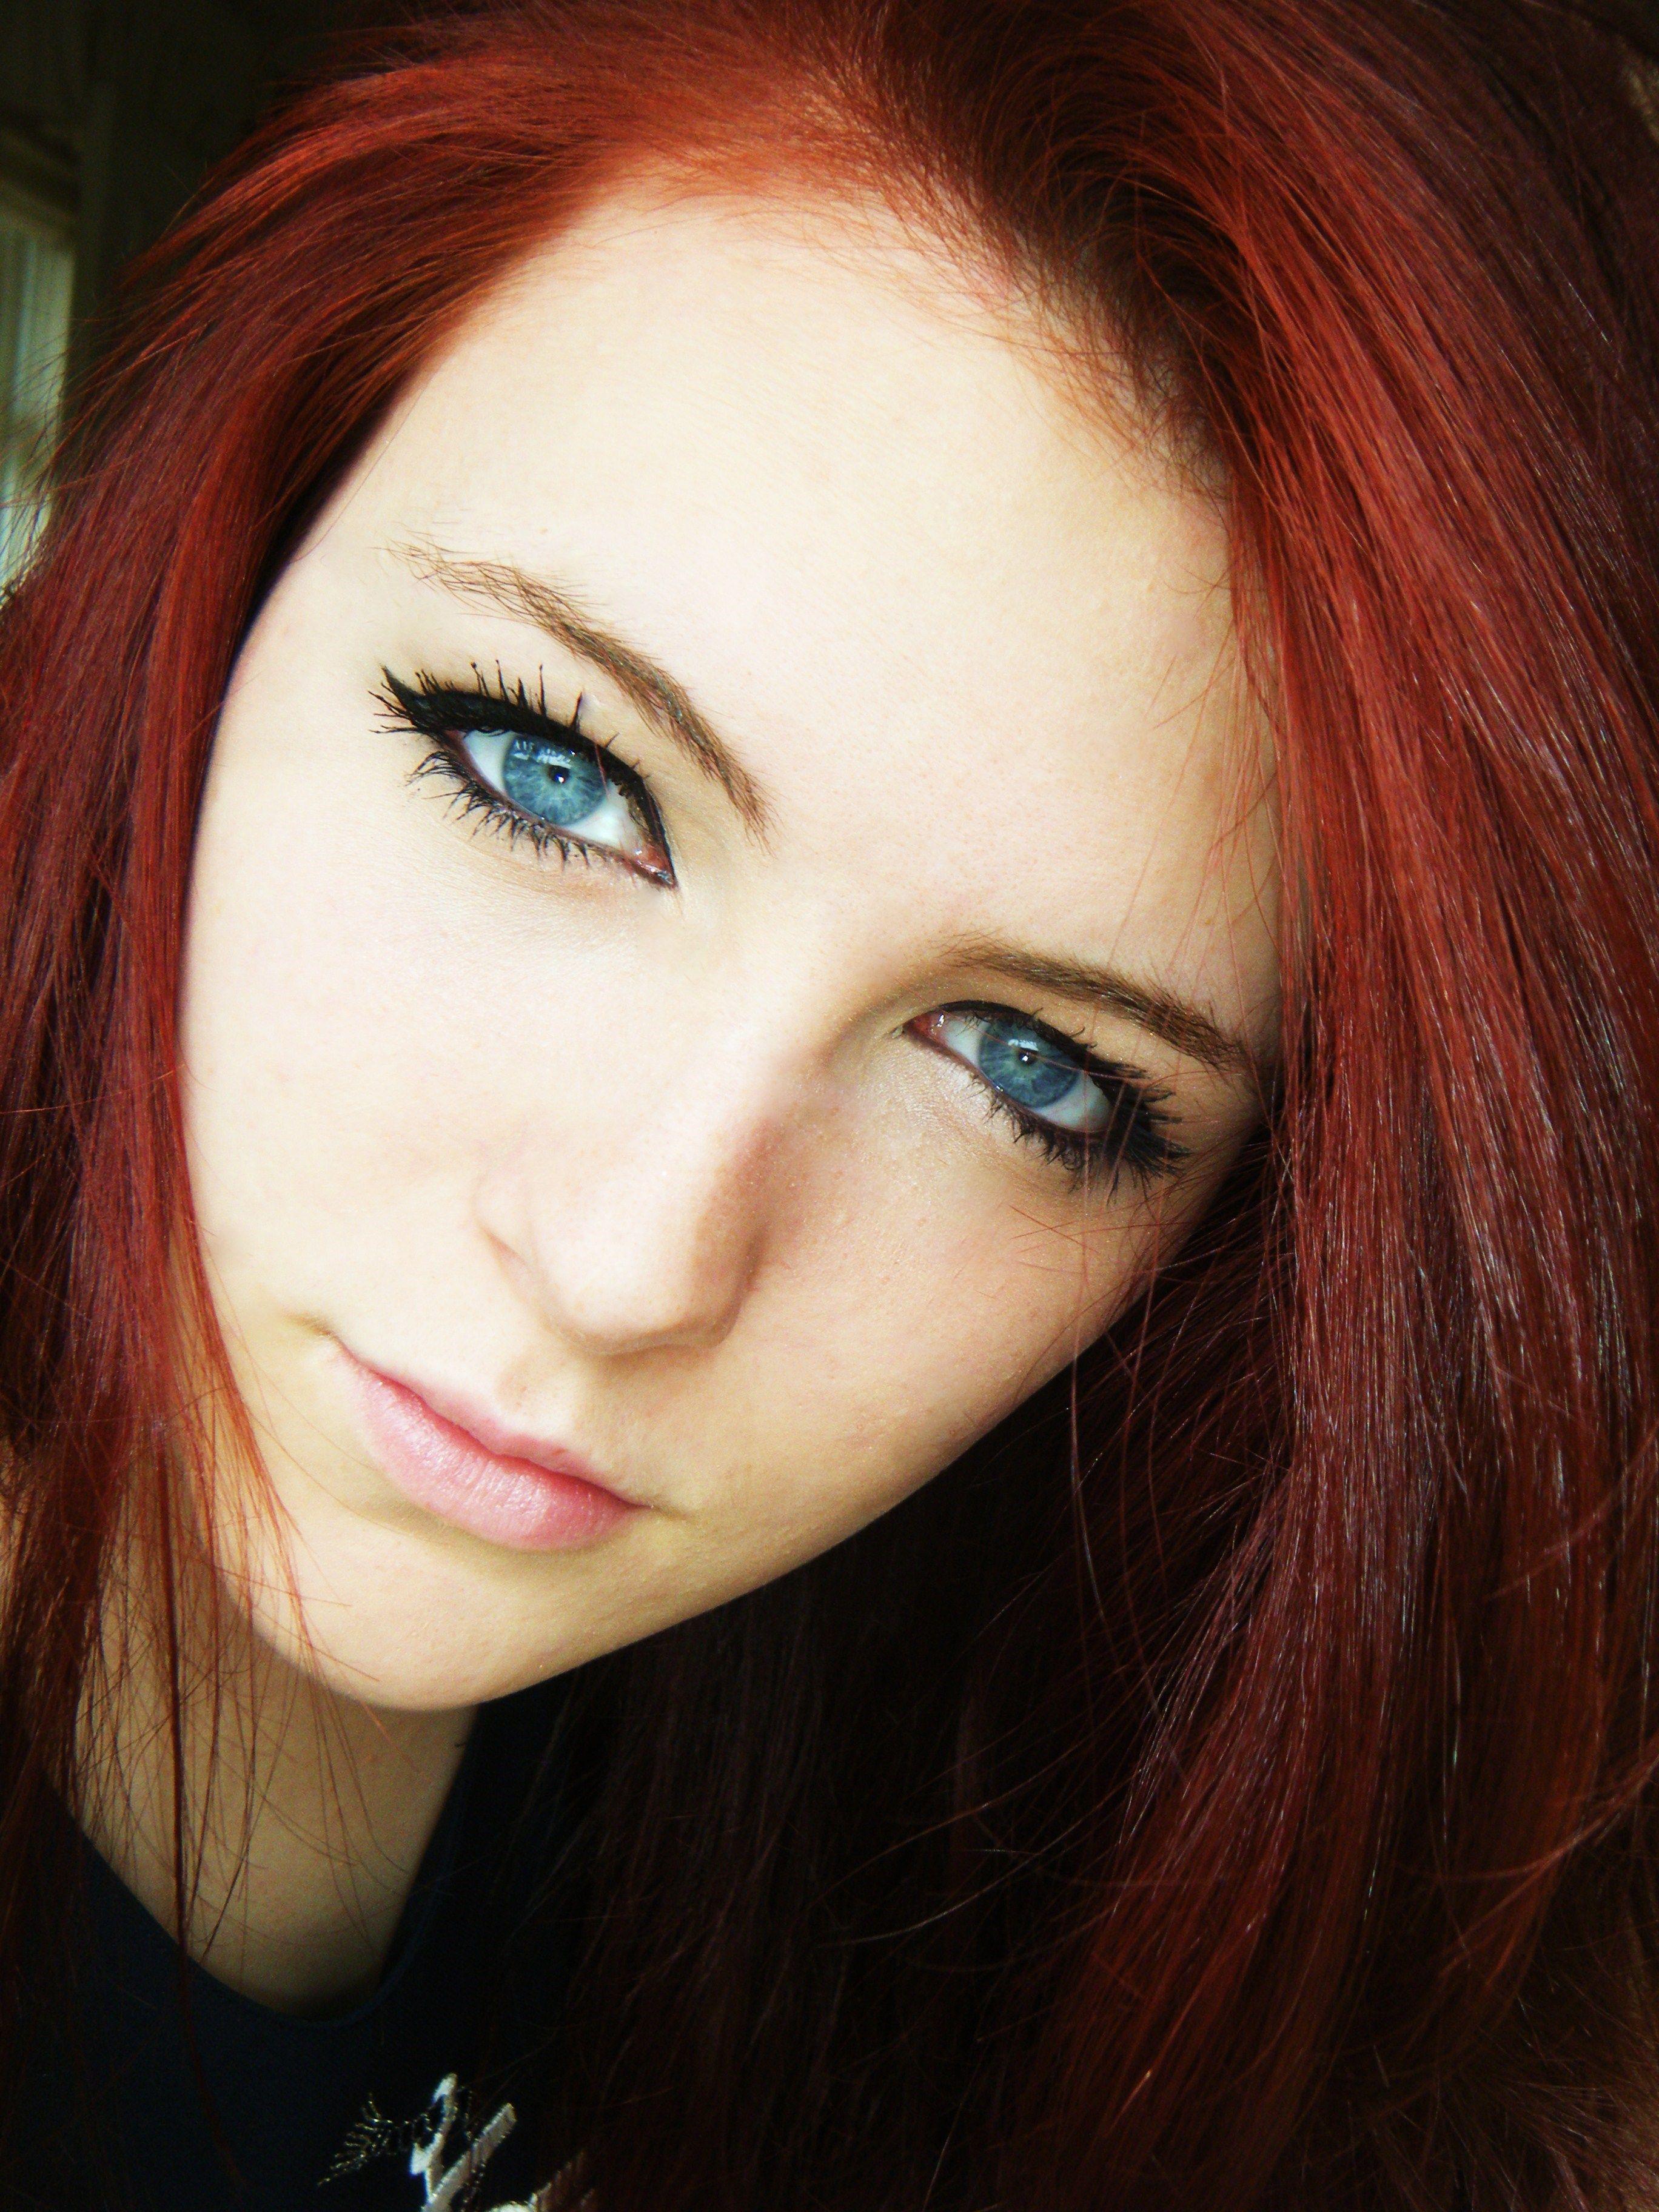 portrait - red hair, blue eyes | red hair blue eyes, girls